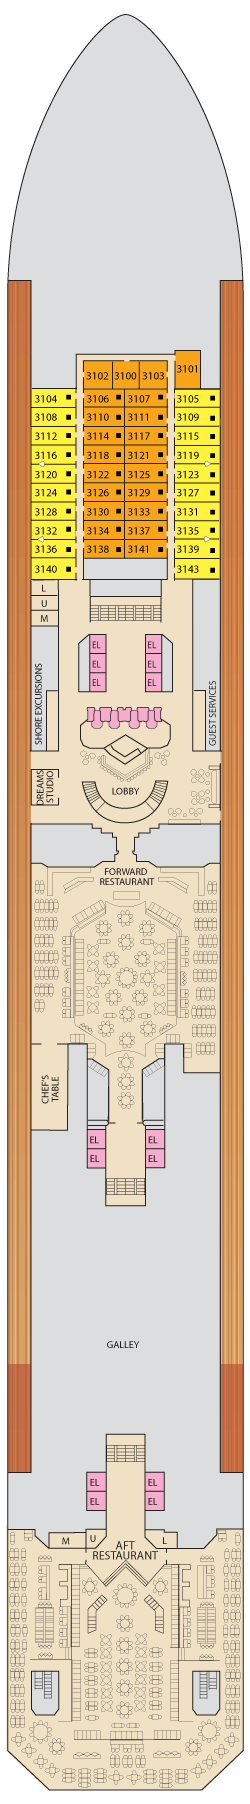 Lobby - Deck 3